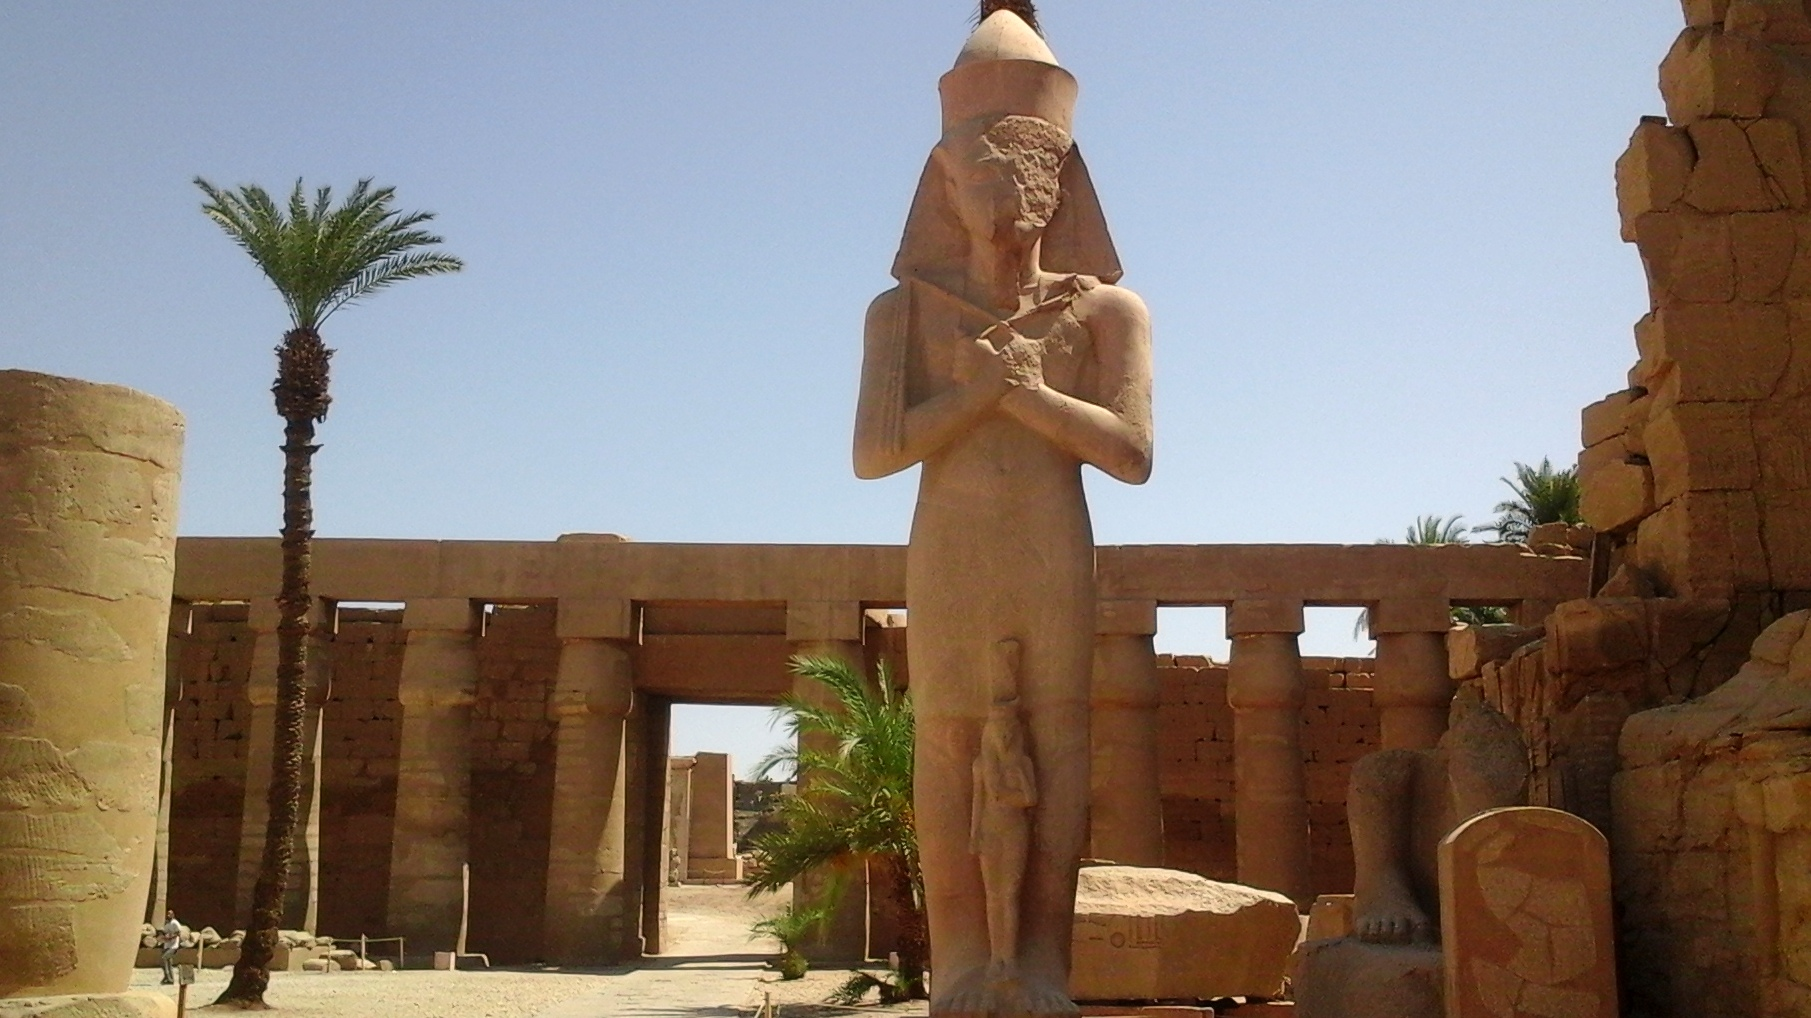 Temple of_karnak in Luxor